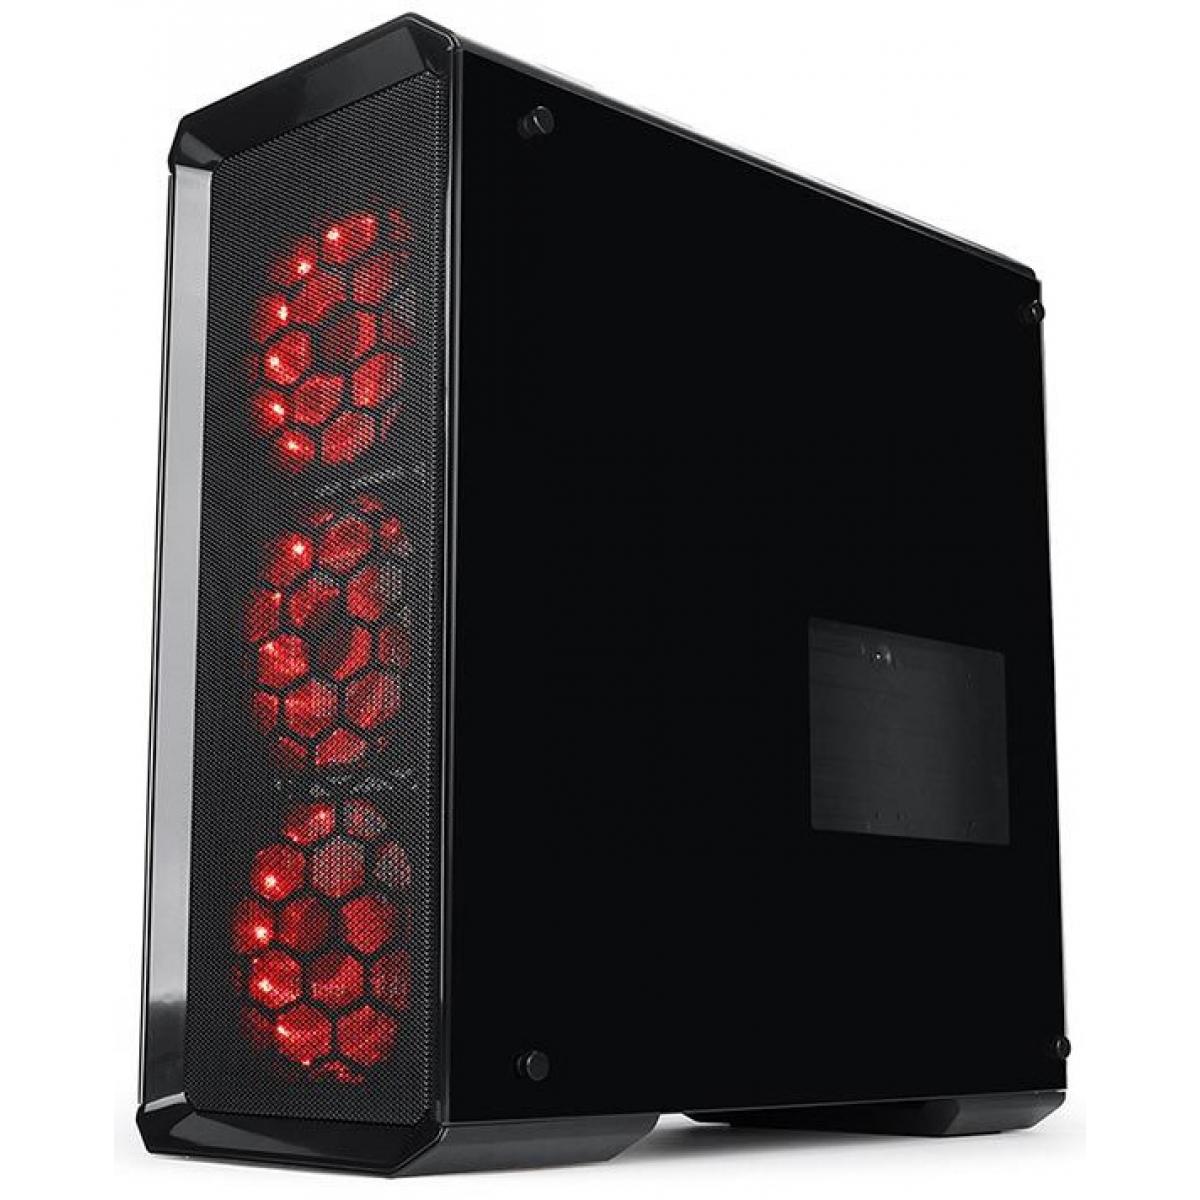 Gabinete Gamer Redragon, Grimlock RGB, Mid Tower, Vidro Temperado, Black, Sem Fonte, Com 3 Fans